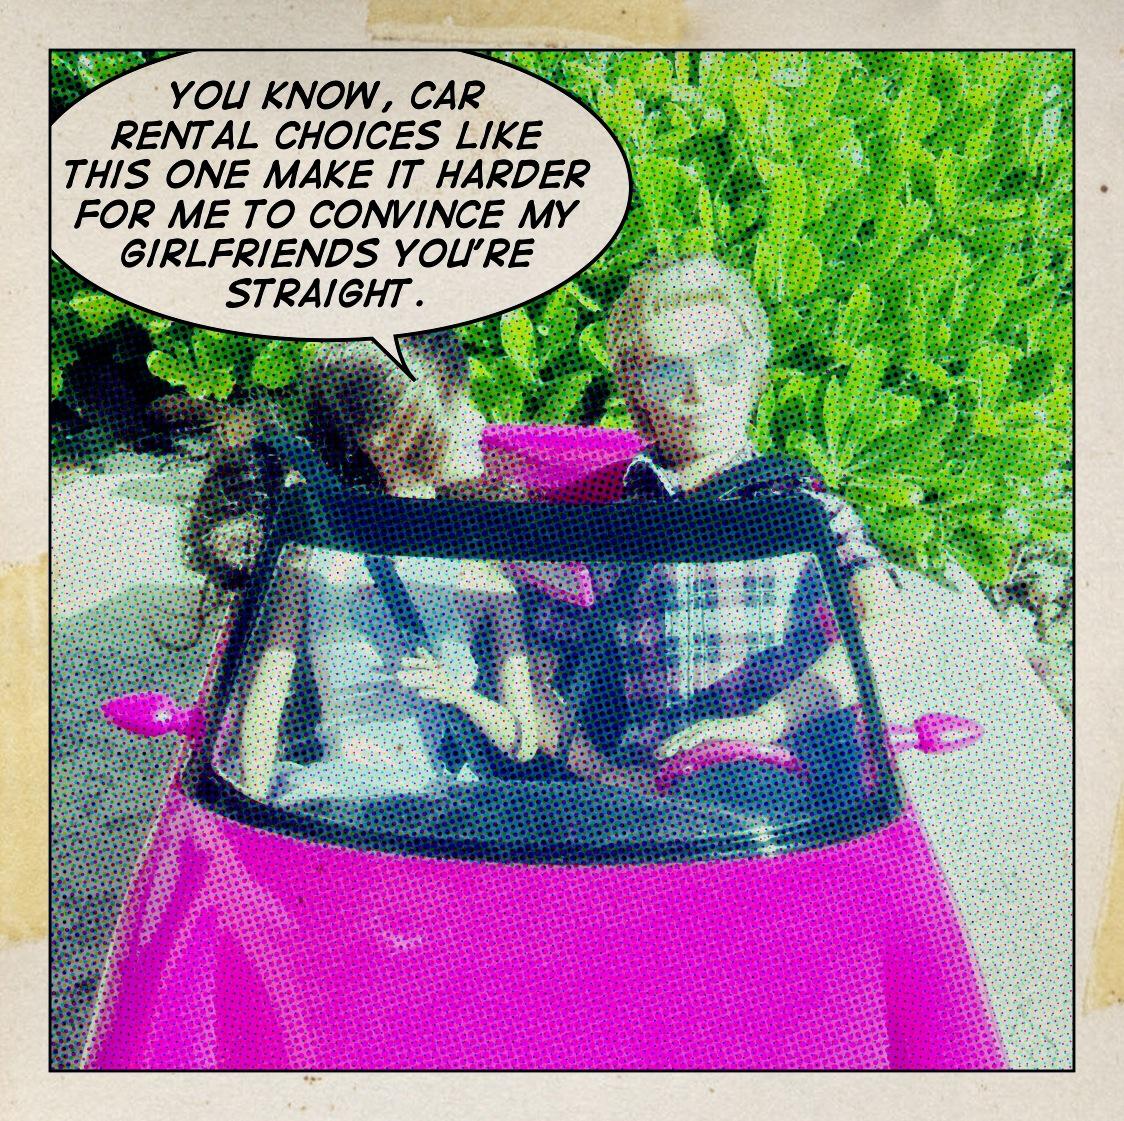 pink car.jpeg